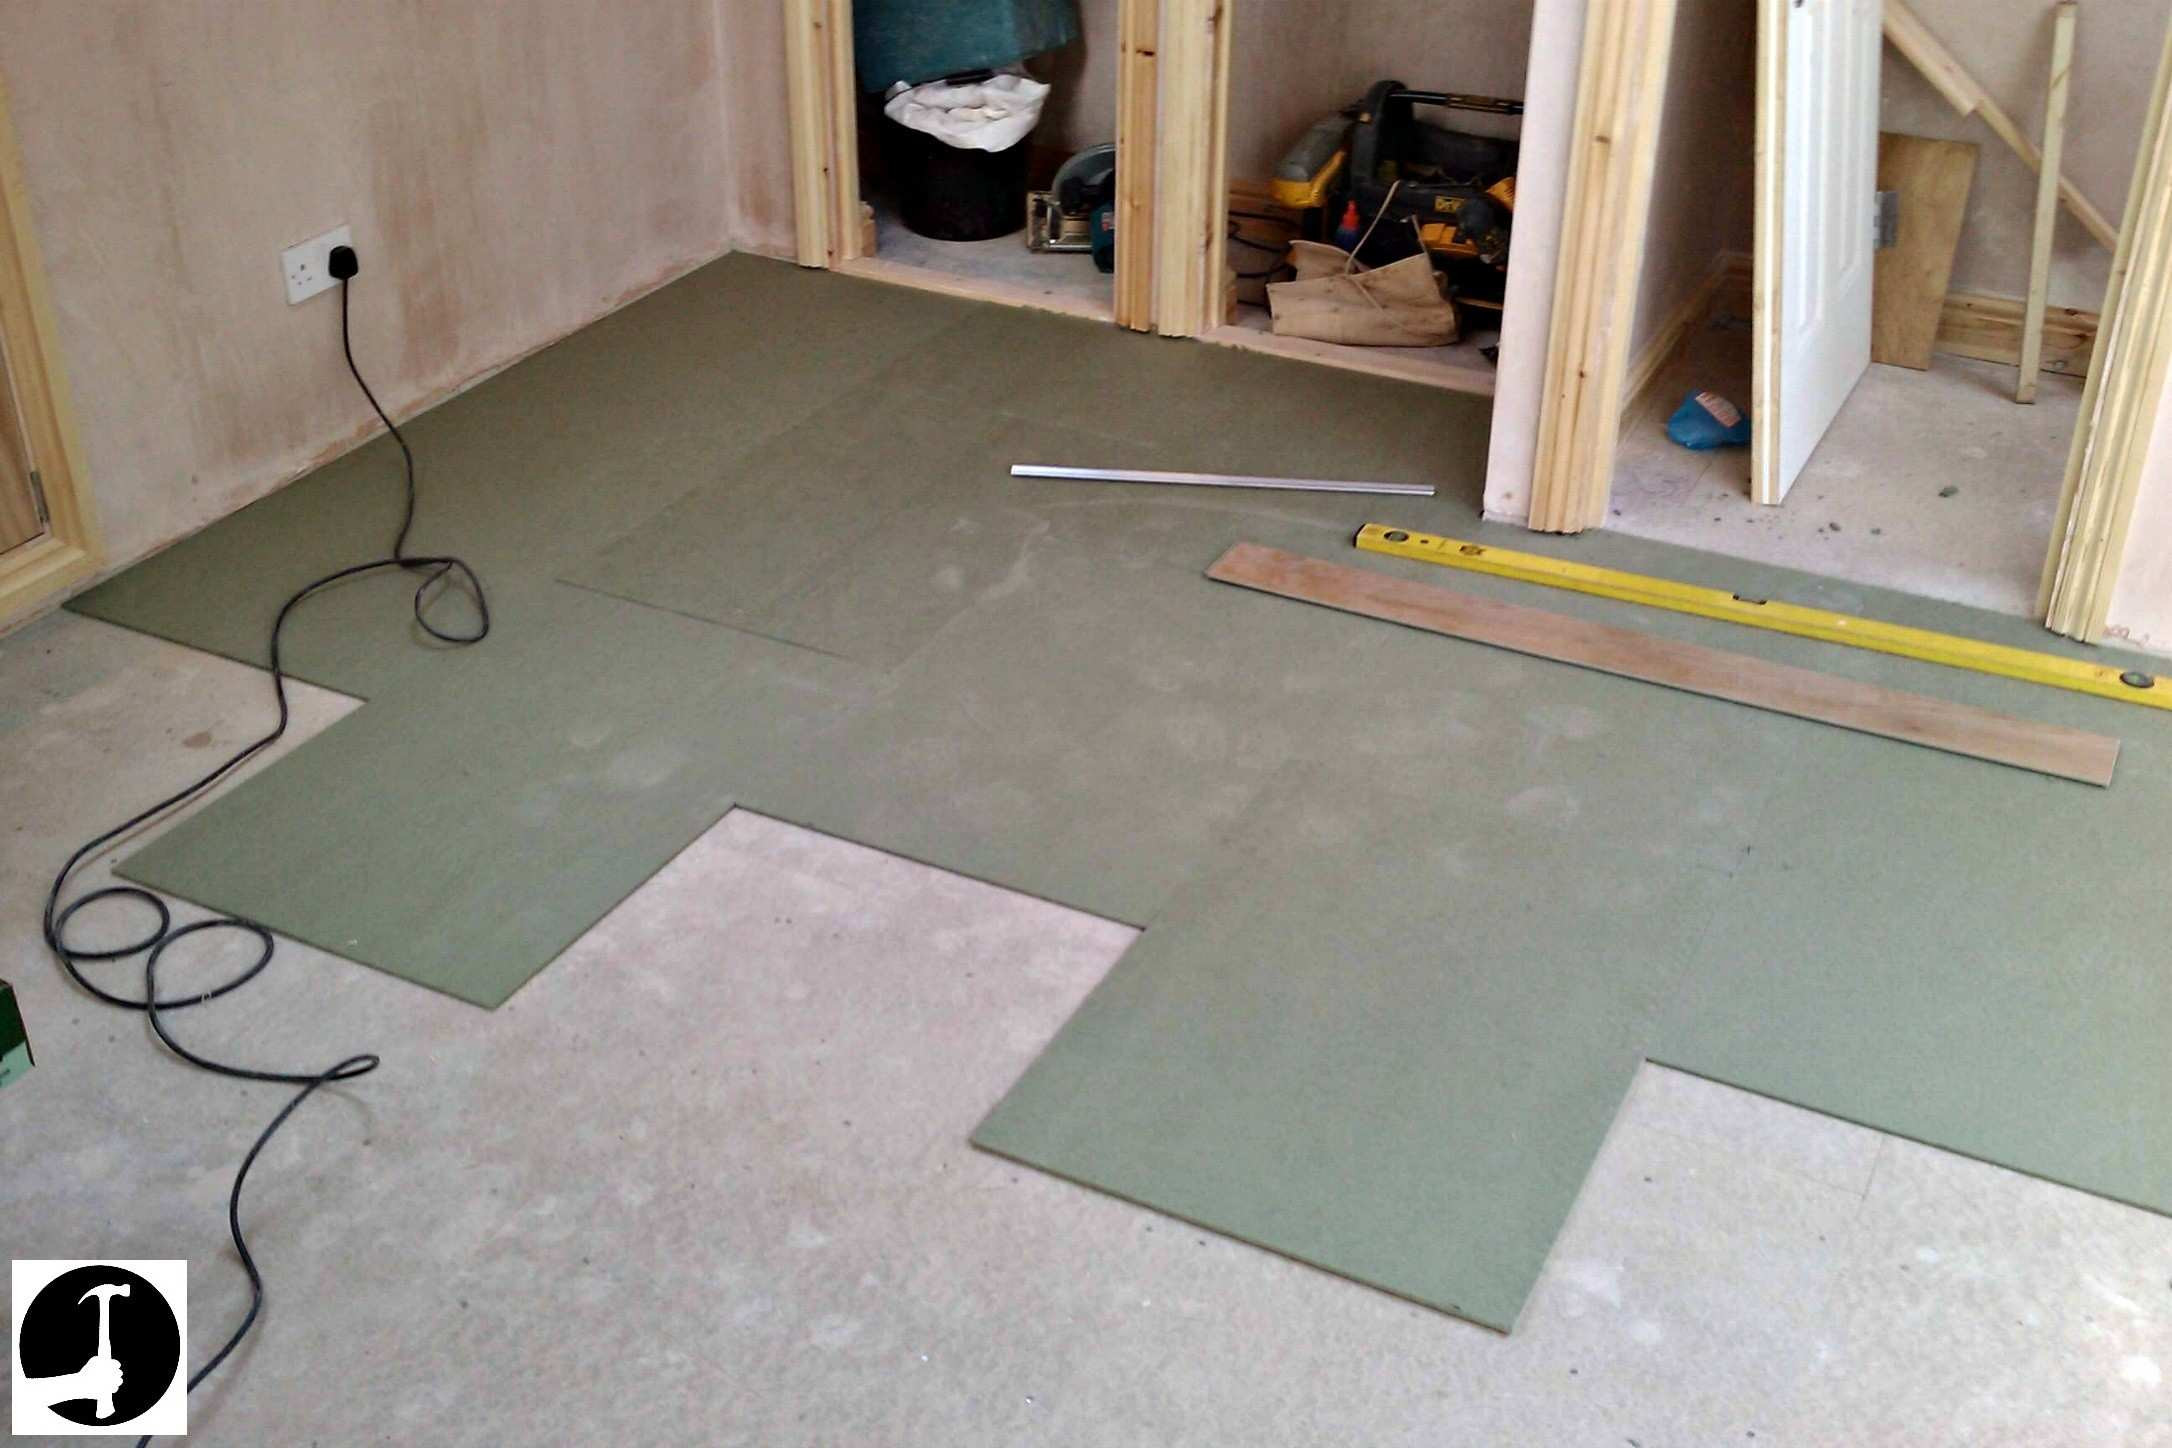 installing underlayment for hardwood floors of installing laminate flooring video elegant how to install laminate intended for how to install laminate flooring